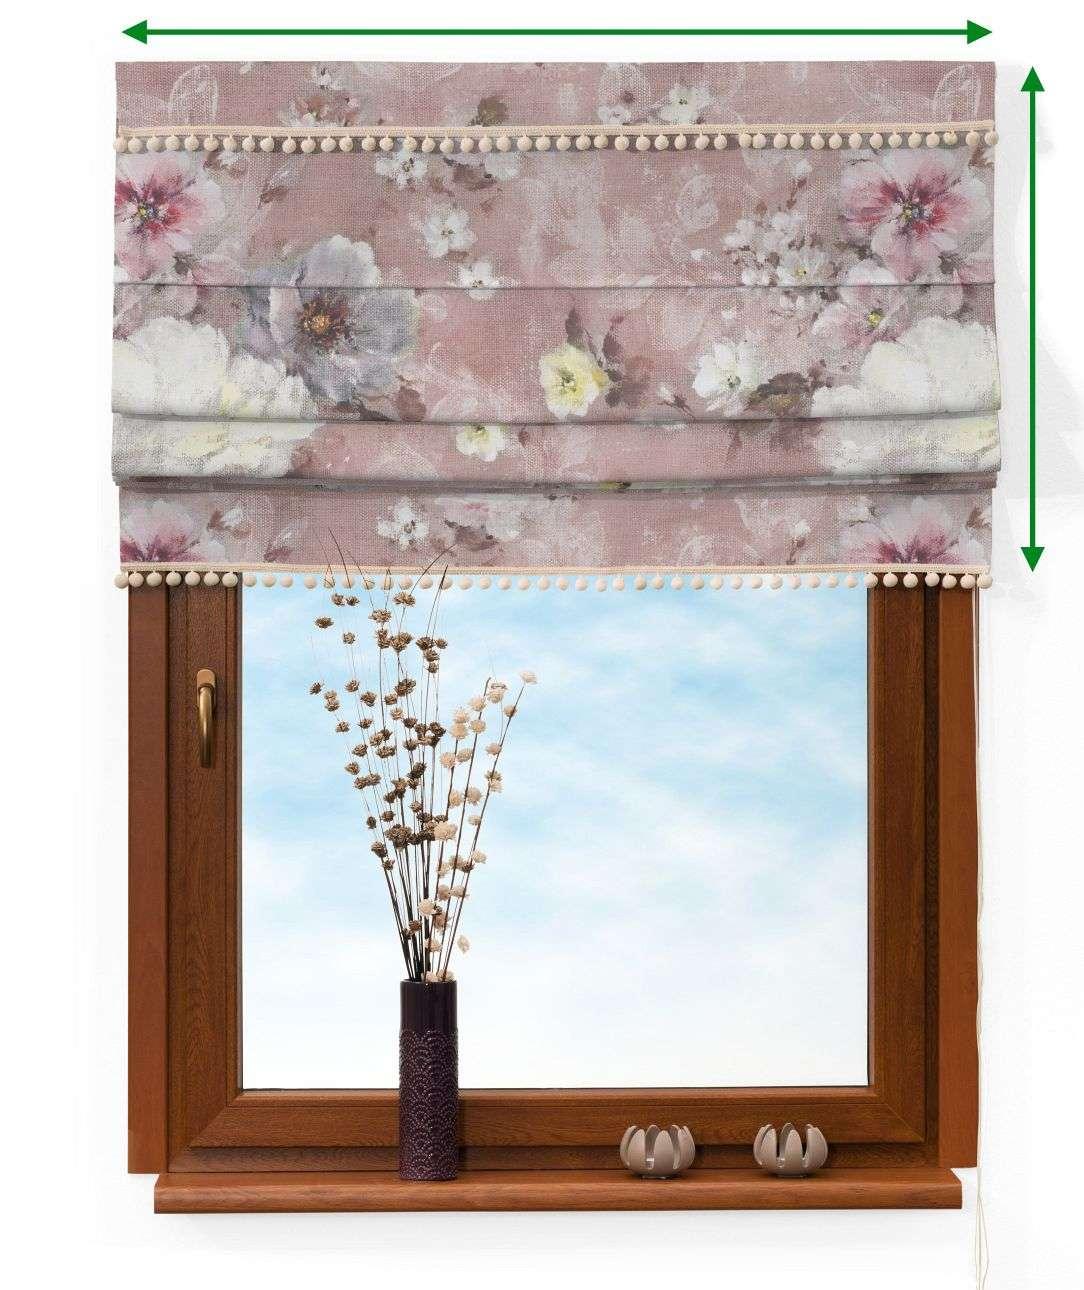 Rímska roleta Padva s brmbolcami V kolekcii Monet, tkanina: 137-83